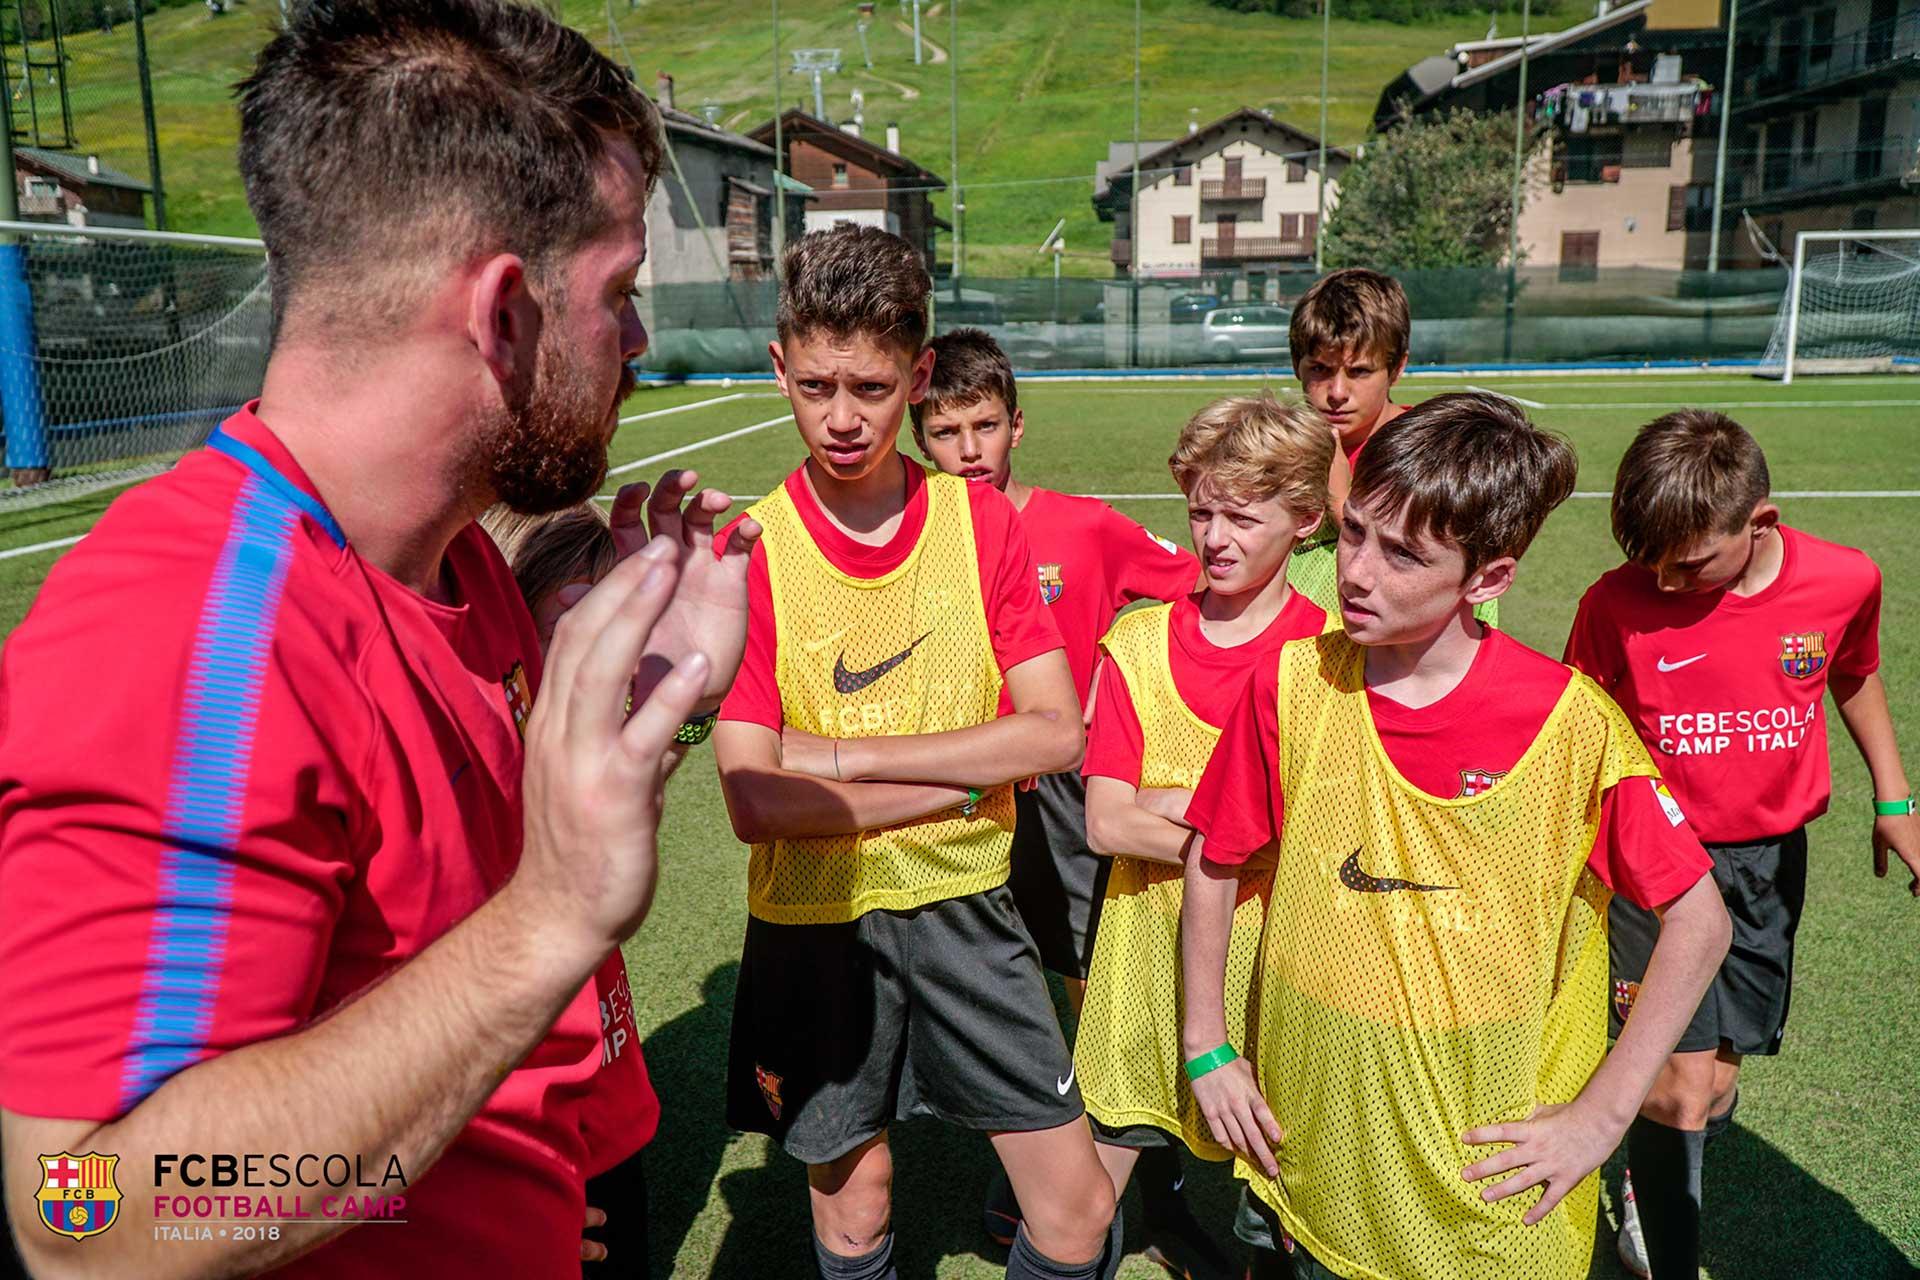 FCB Camp Italia